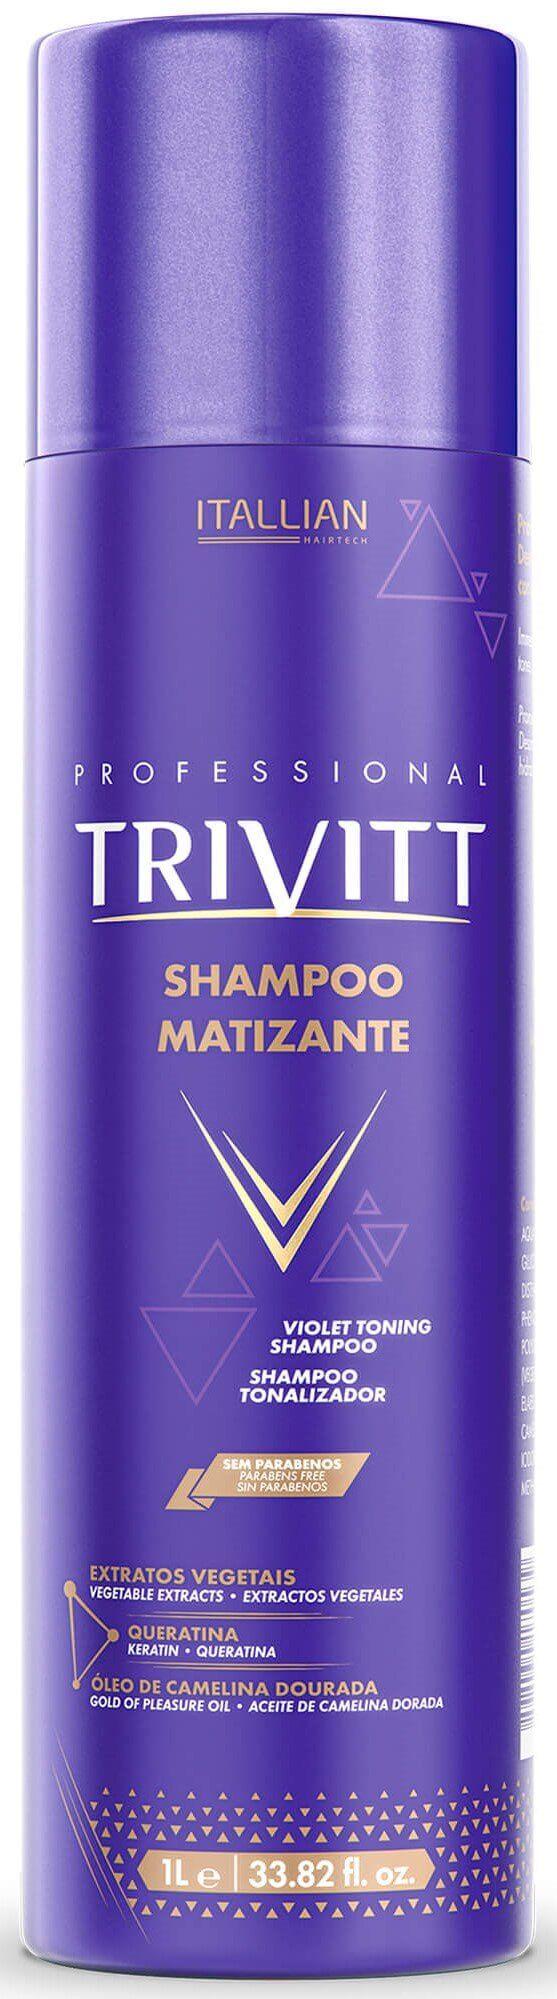 Shampoo Matizante Itallian Trivitt - 1l